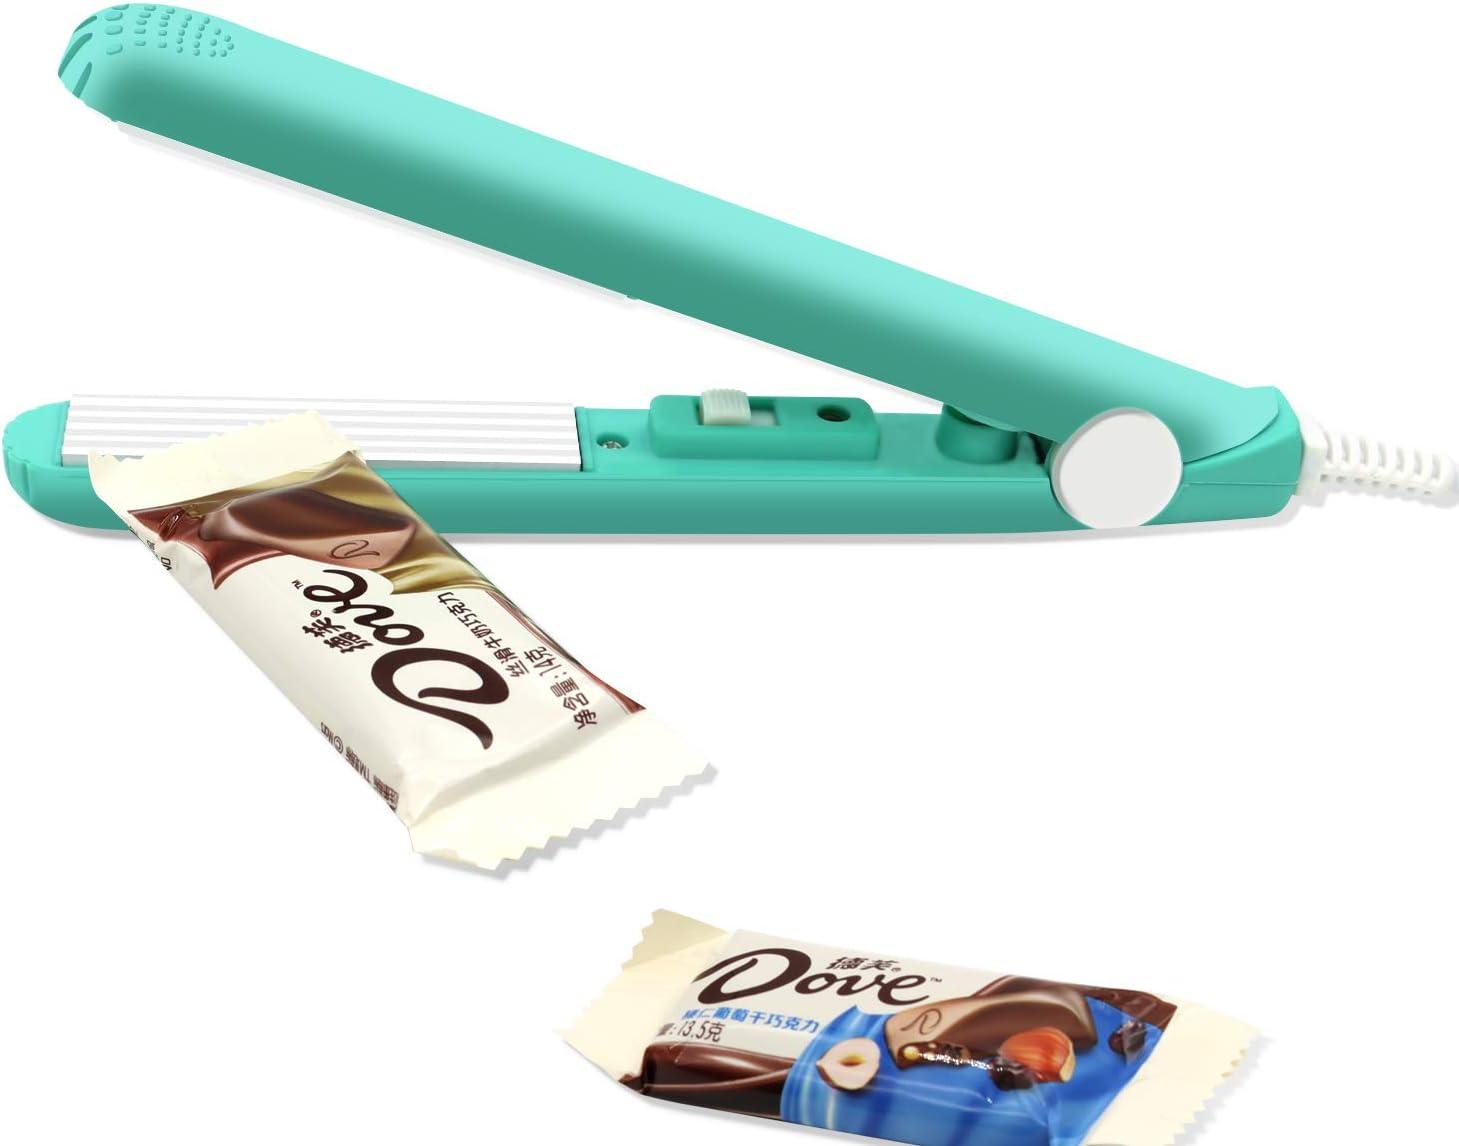 "Mini Bag Sealer Heat Seal, Handheld Food Sealer Bag Resealer for Food Storage, Portable Smart Heat Sealer Machine with 45"" Power Cable for Chip Bags, Plastic Bags, Snack Bags -BLUE"